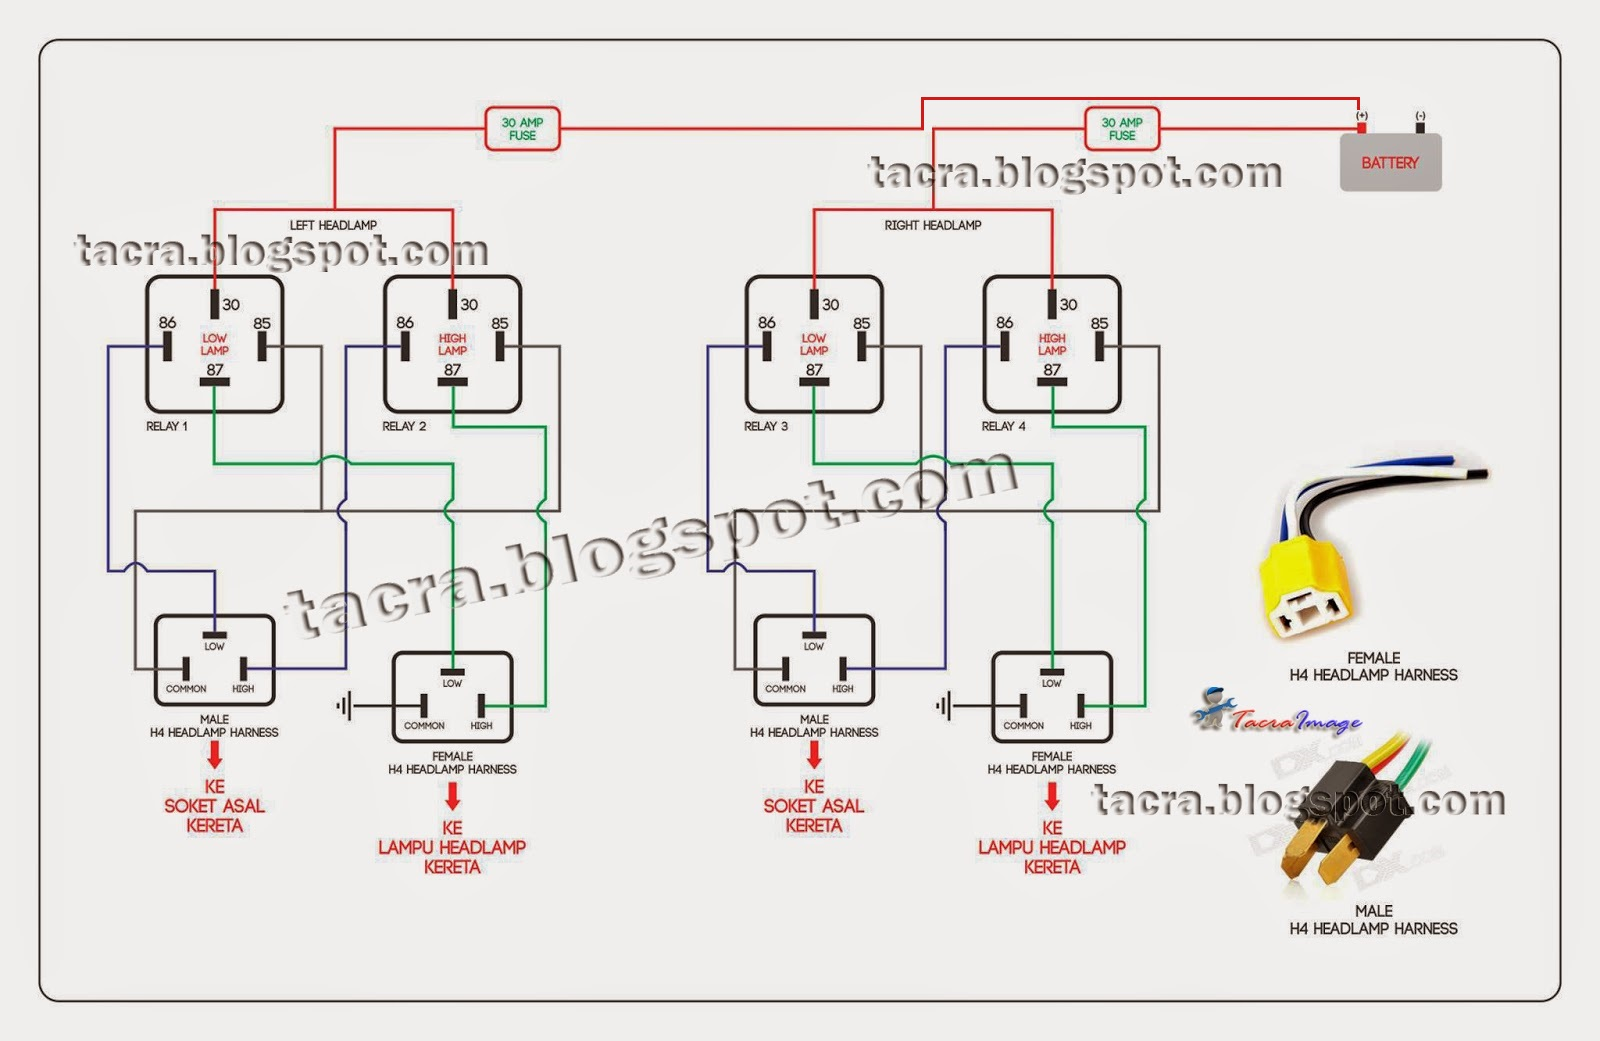 Schematic wiring diagrams proton wira somurich excellent proton wira wiring diagram photos electrical circuit rheidetec 1041 cheapraybanclubmaster Image collections